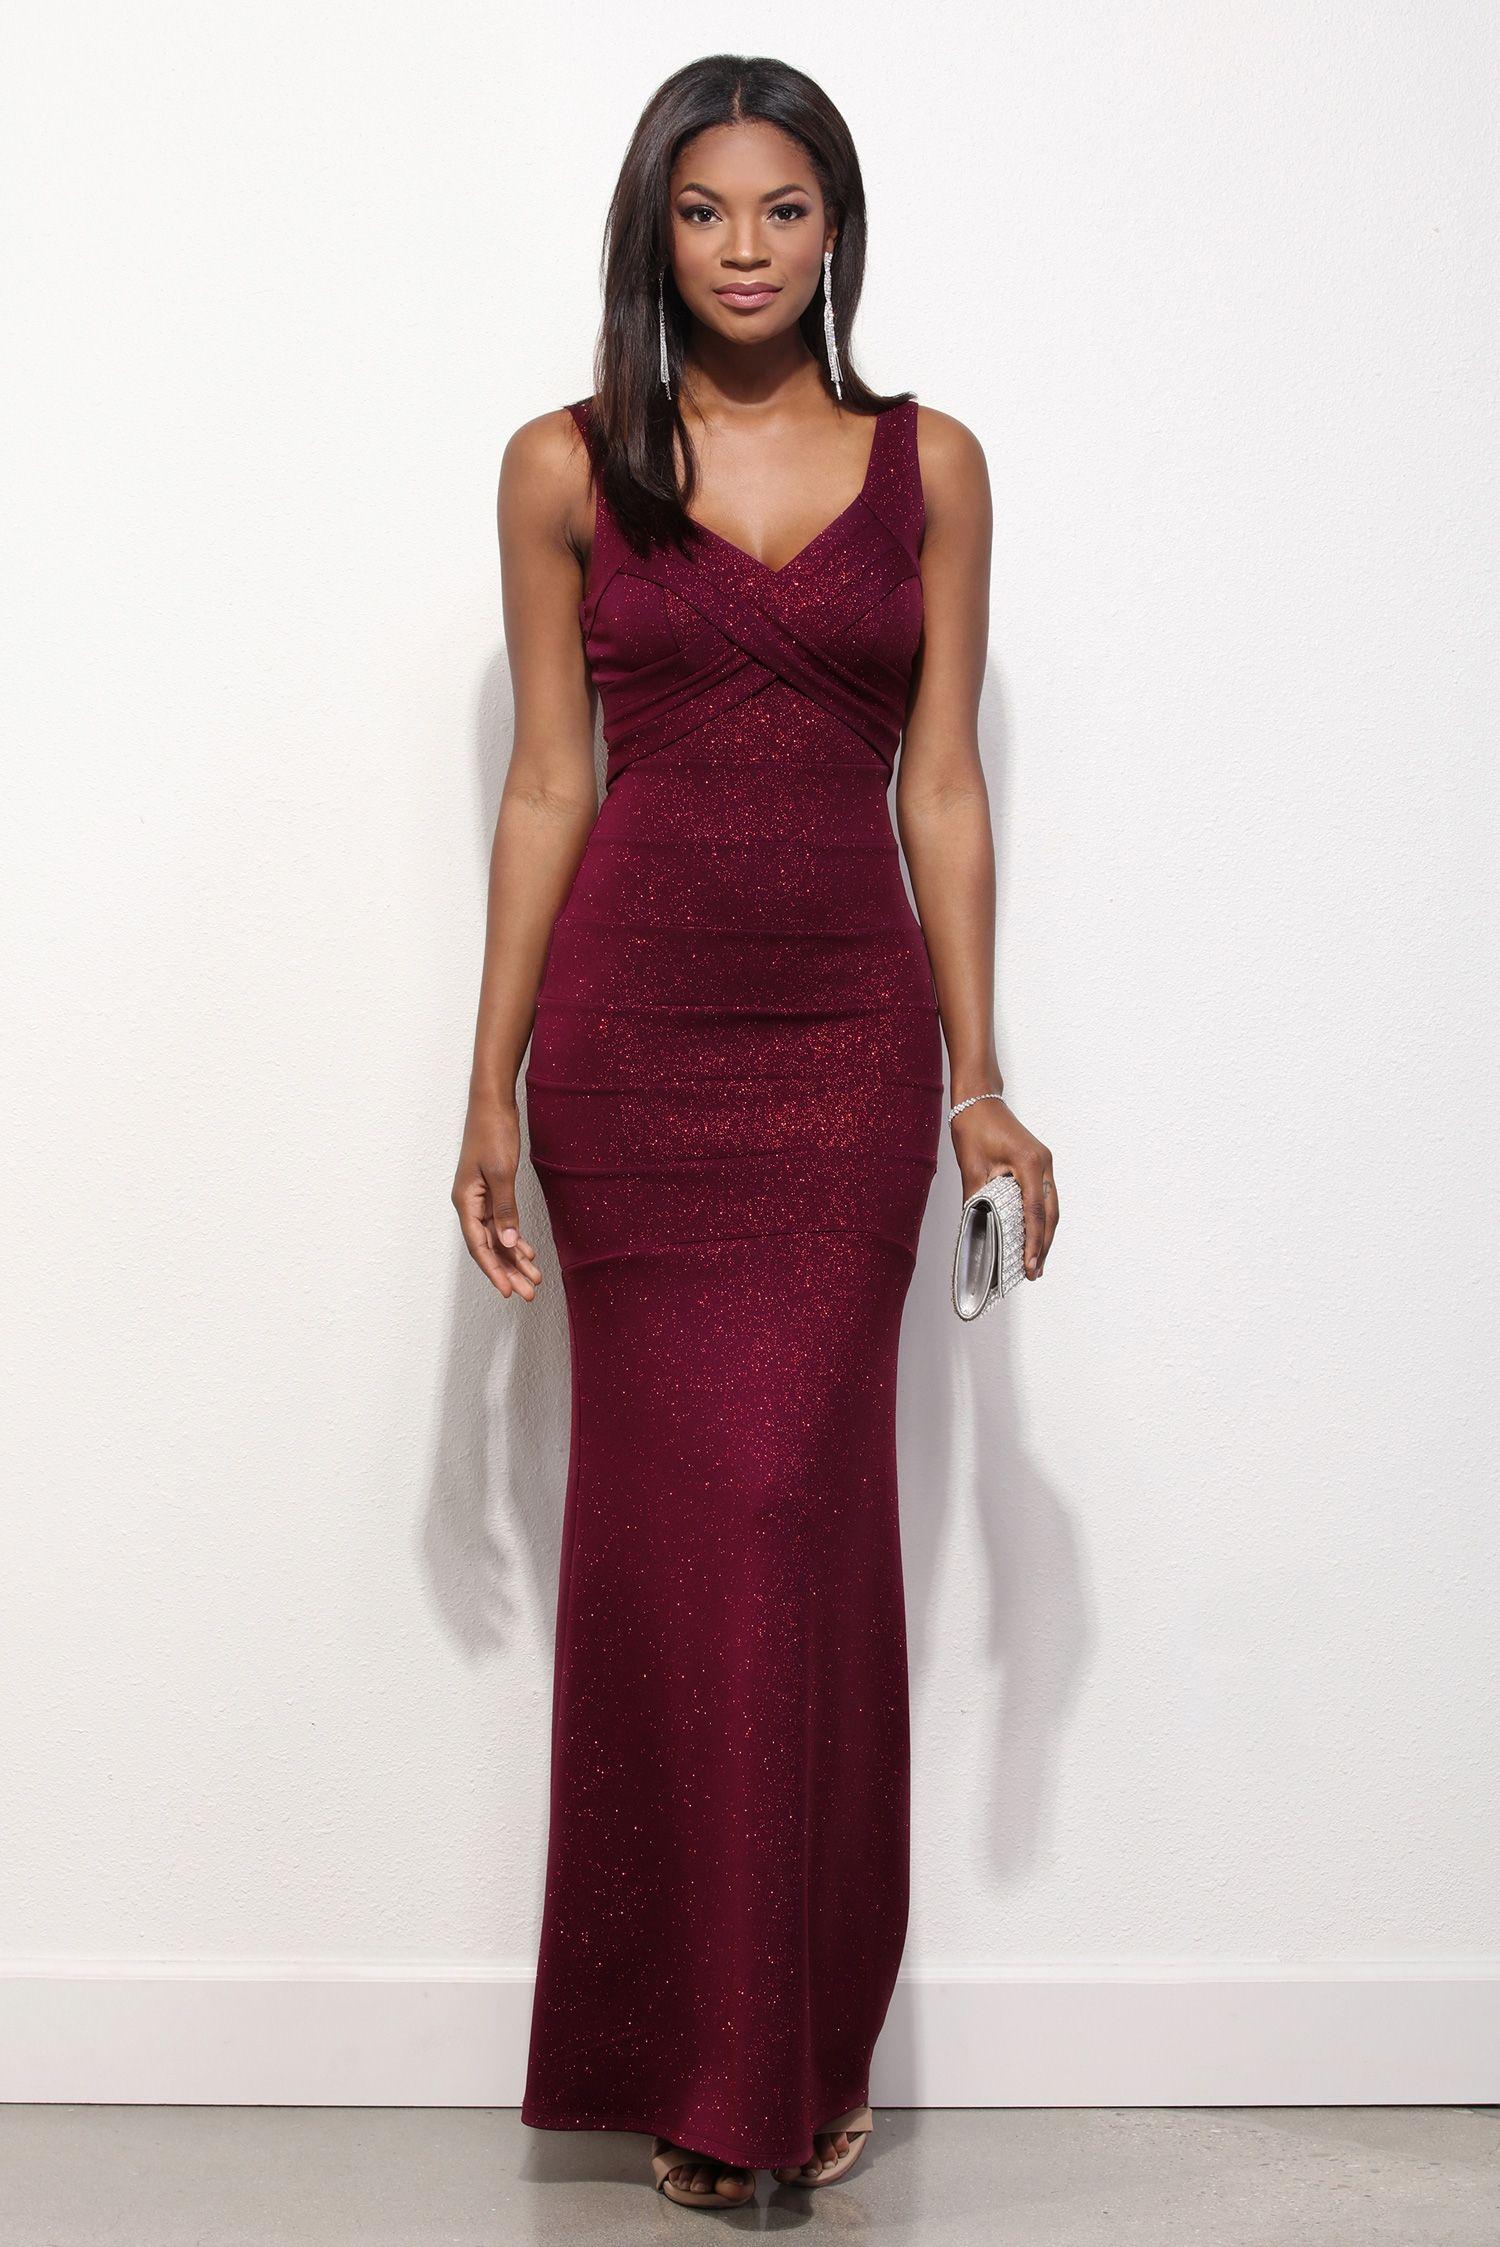 Lorena Burgundy Glitter Prom Dress | Glitter prom dresses, Prom ...